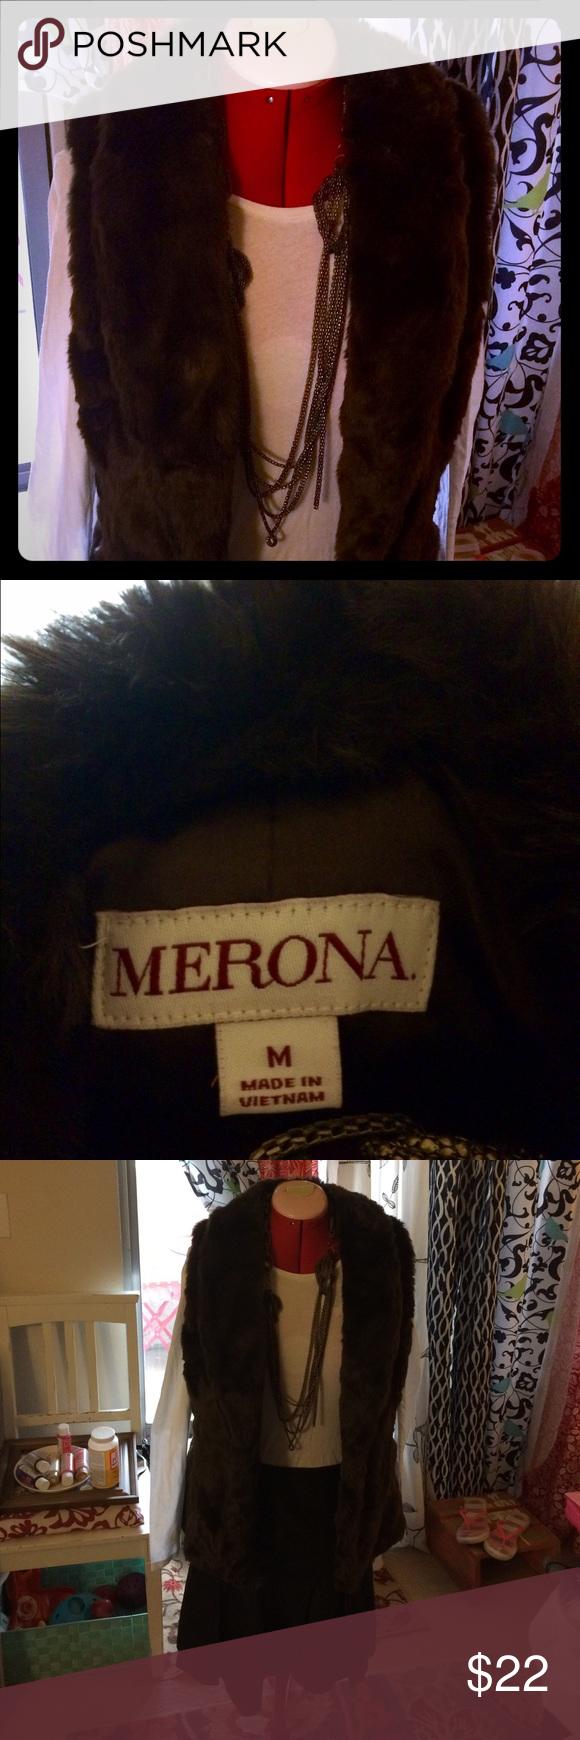 Chocolate brown fur vest Chocolate brown fur vest. Never worn. Merona brand. Size medium. Super soft! Jackets & Coats Vests